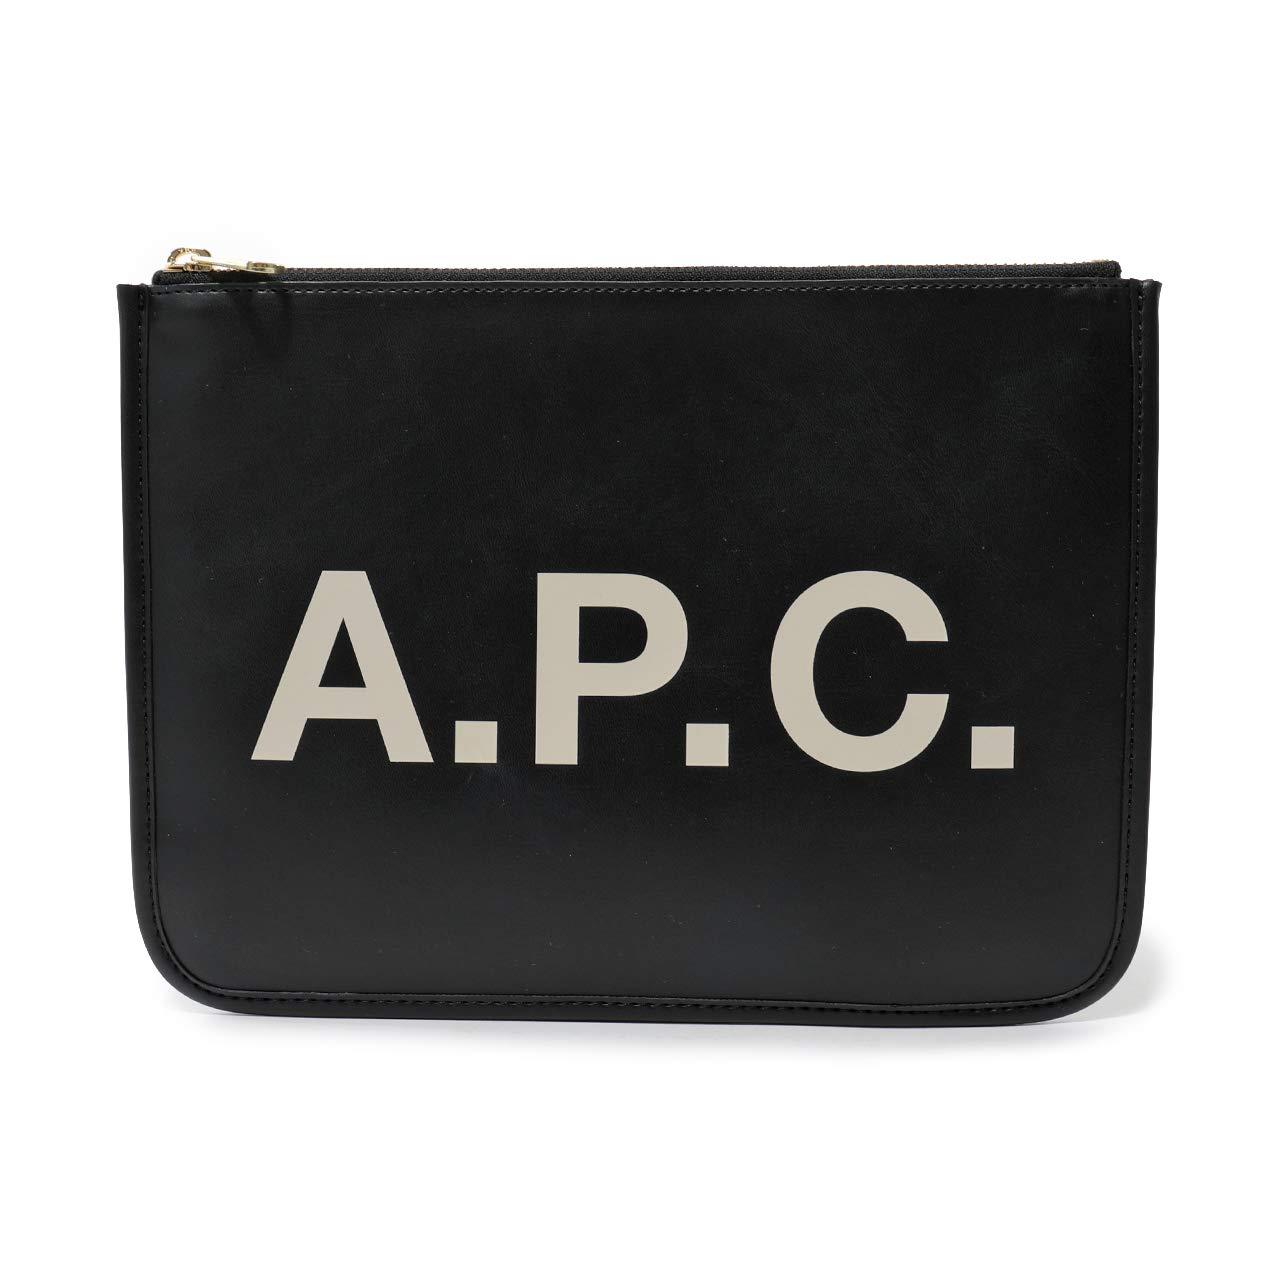 APC A.P.C. アーペーセー PUAAJ F63229 pochette morgane LZZ クラッチバッグ ポーチ NOIR ユニセックス / [並行輸入品] B07JW3ZM67